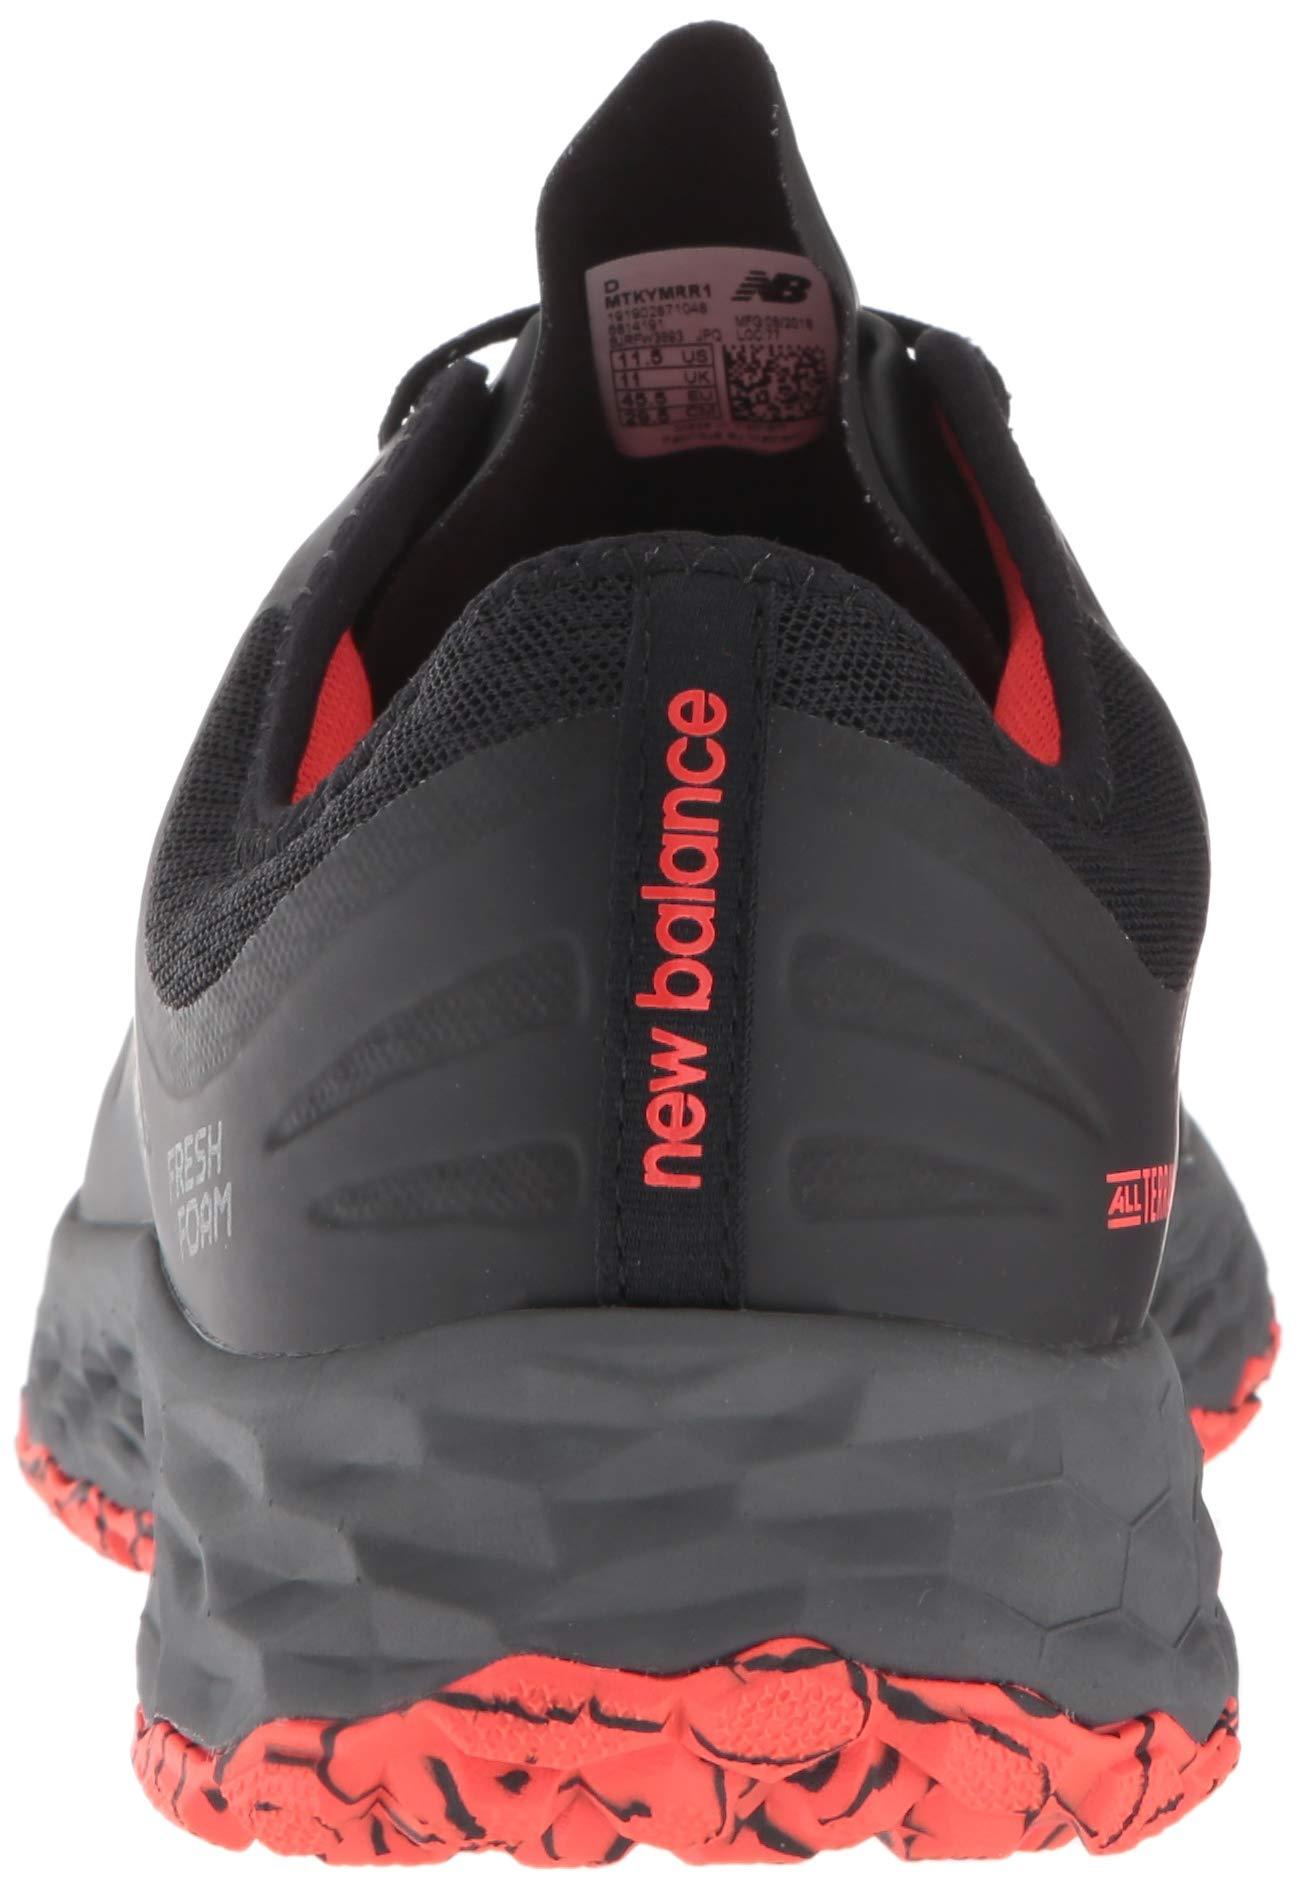 New Balance Men's Kaymin V1 Fresh Foam Trail Running Shoe, Black/Flame/Reflective, 1.5 D US by New Balance (Image #2)